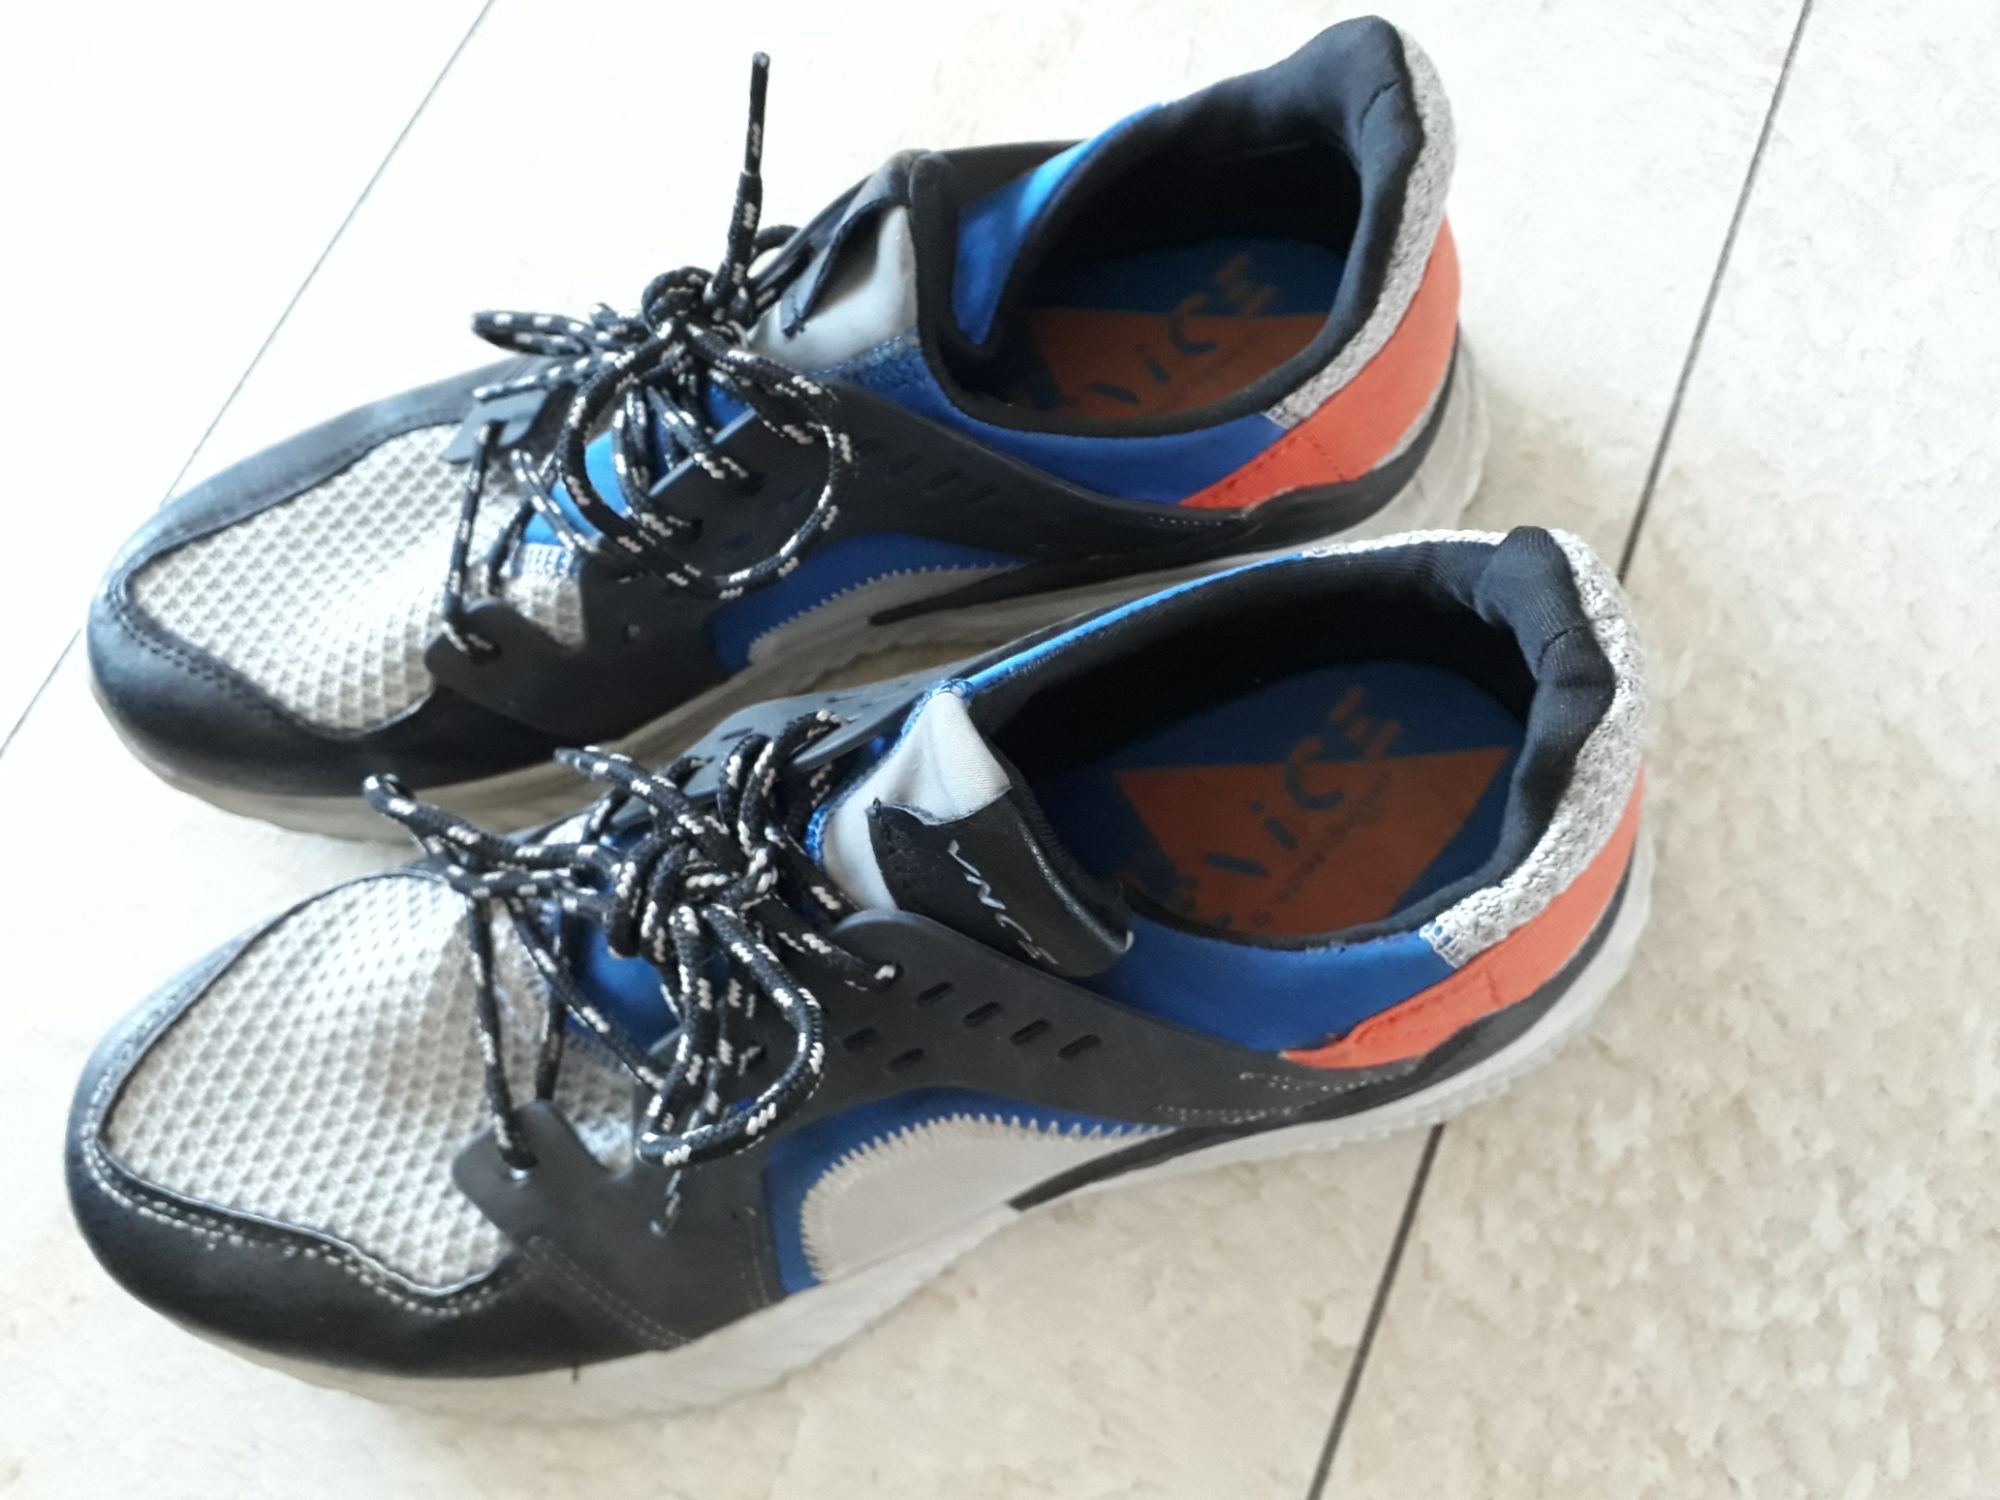 Mooie vence schoenen